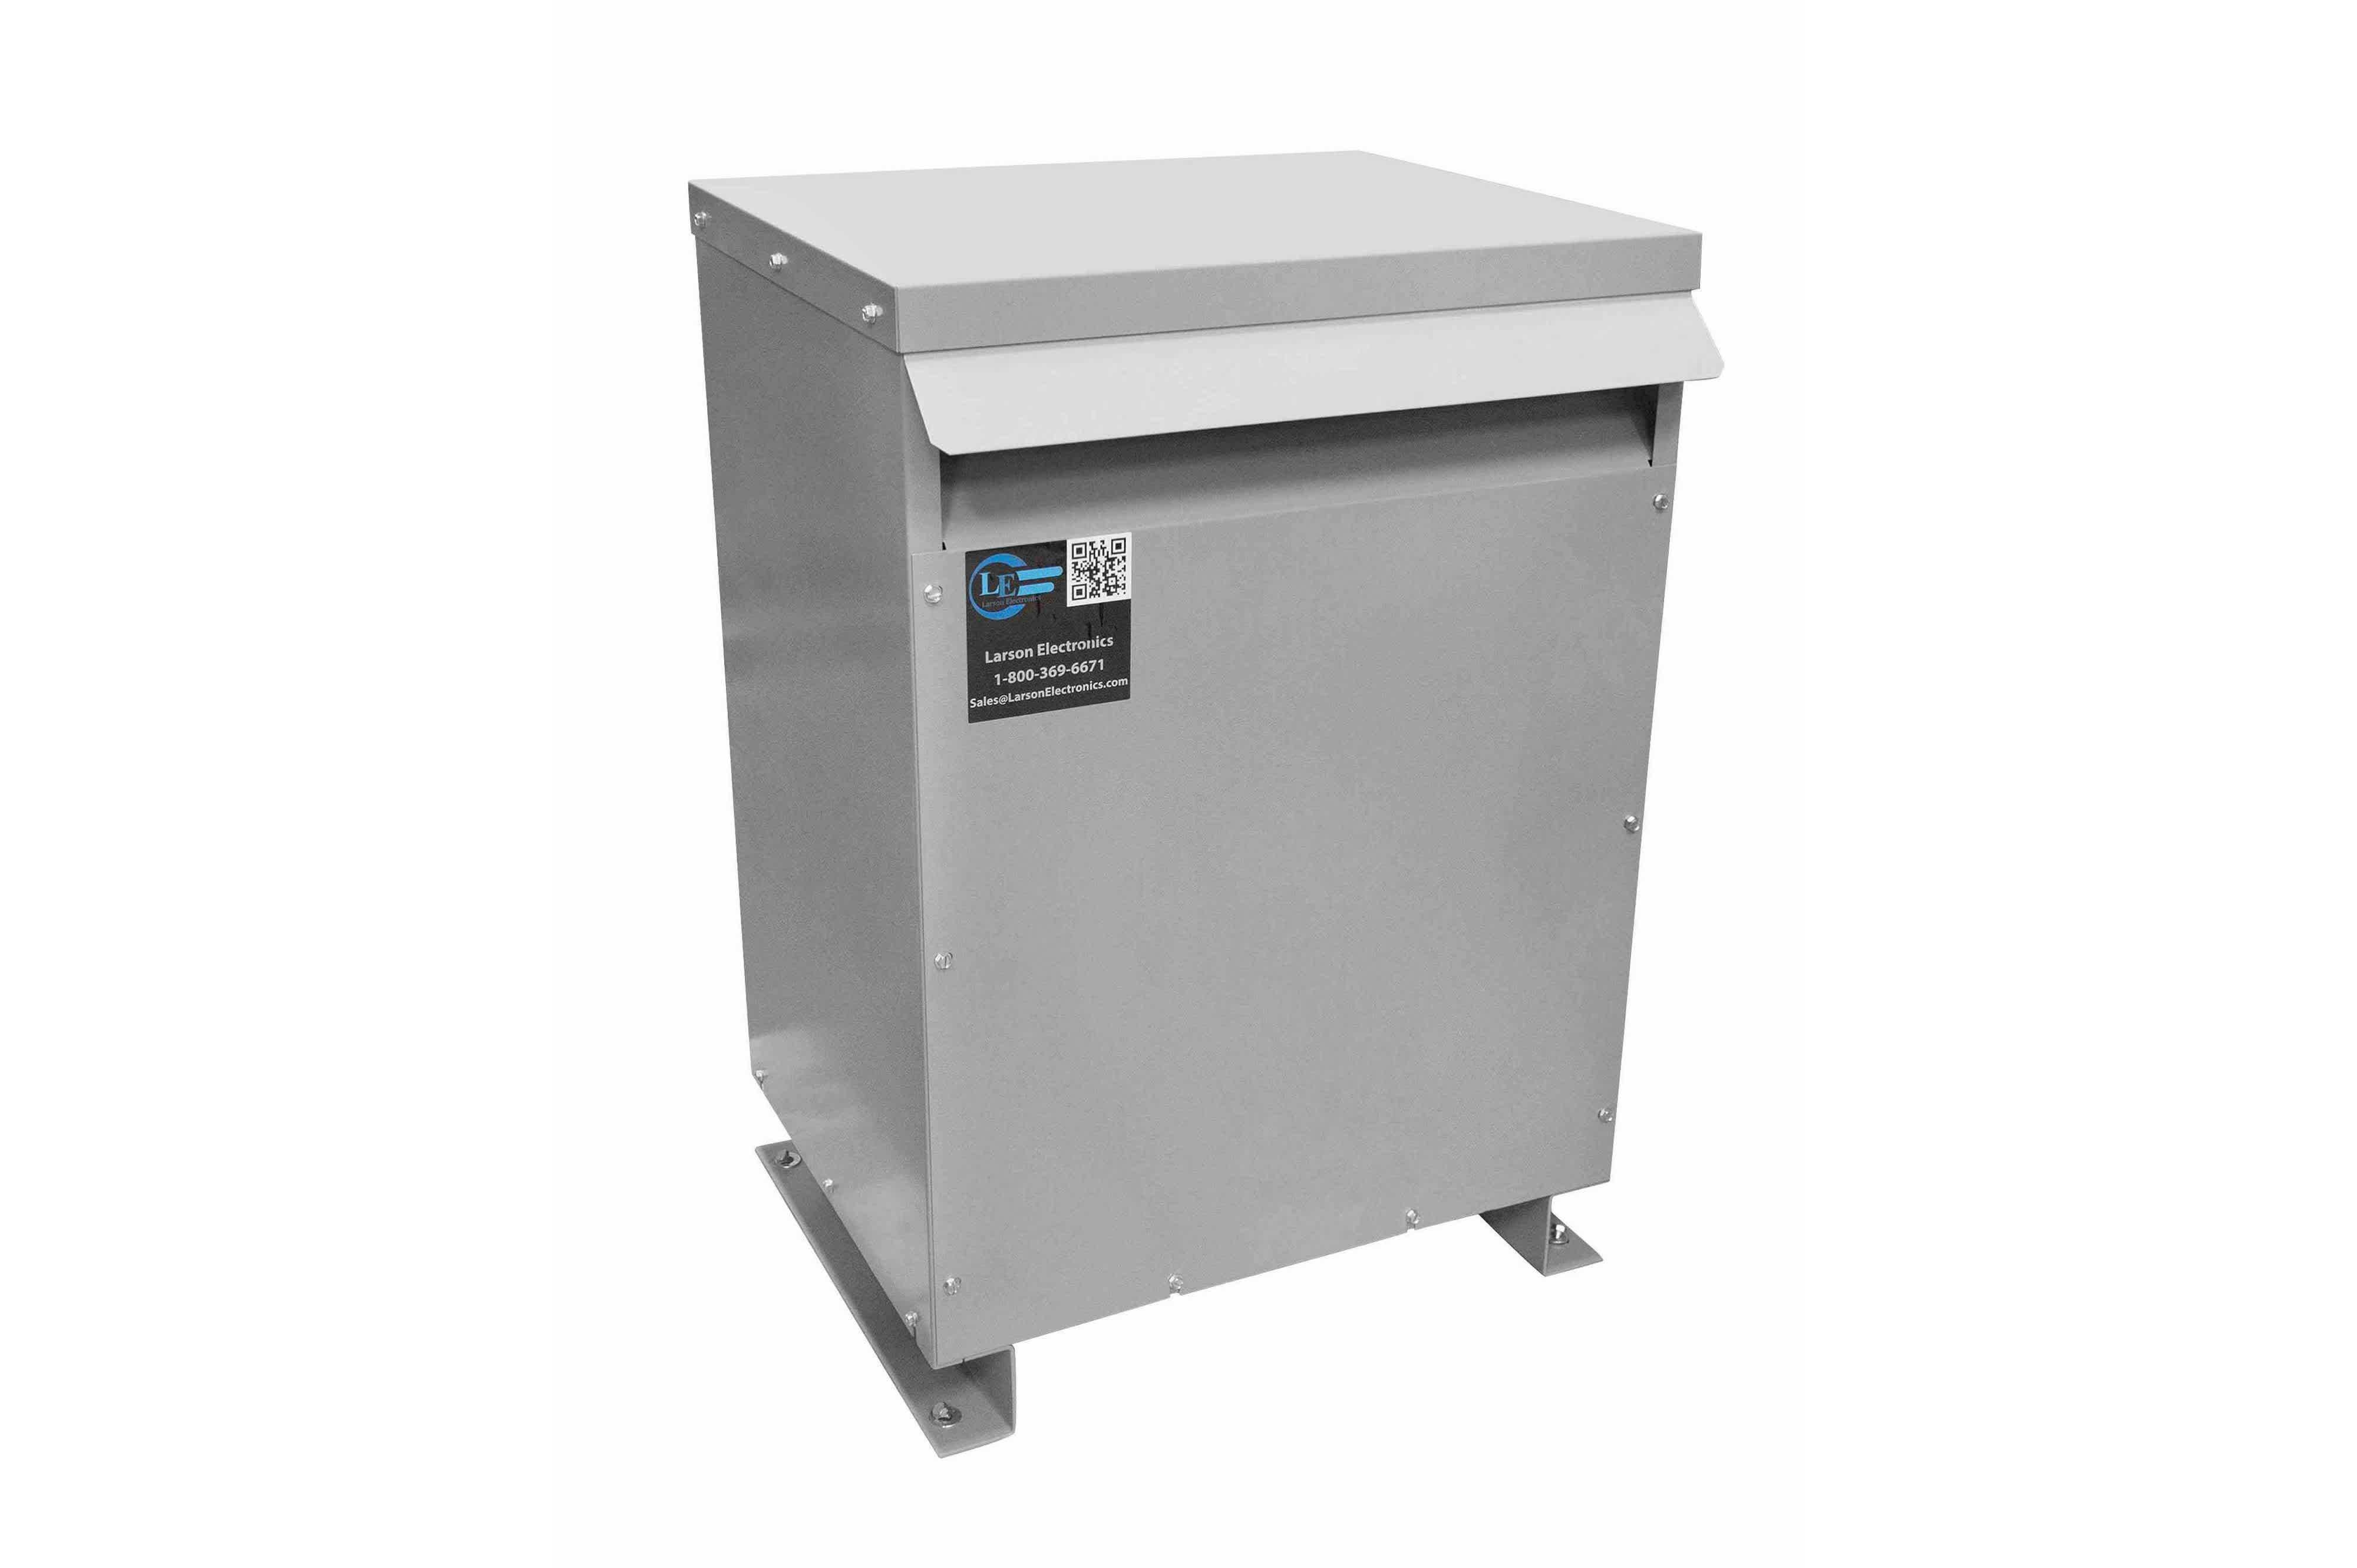 22.5 kVA 3PH Isolation Transformer, 480V Wye Primary, 400V Delta Secondary, N3R, Ventilated, 60 Hz